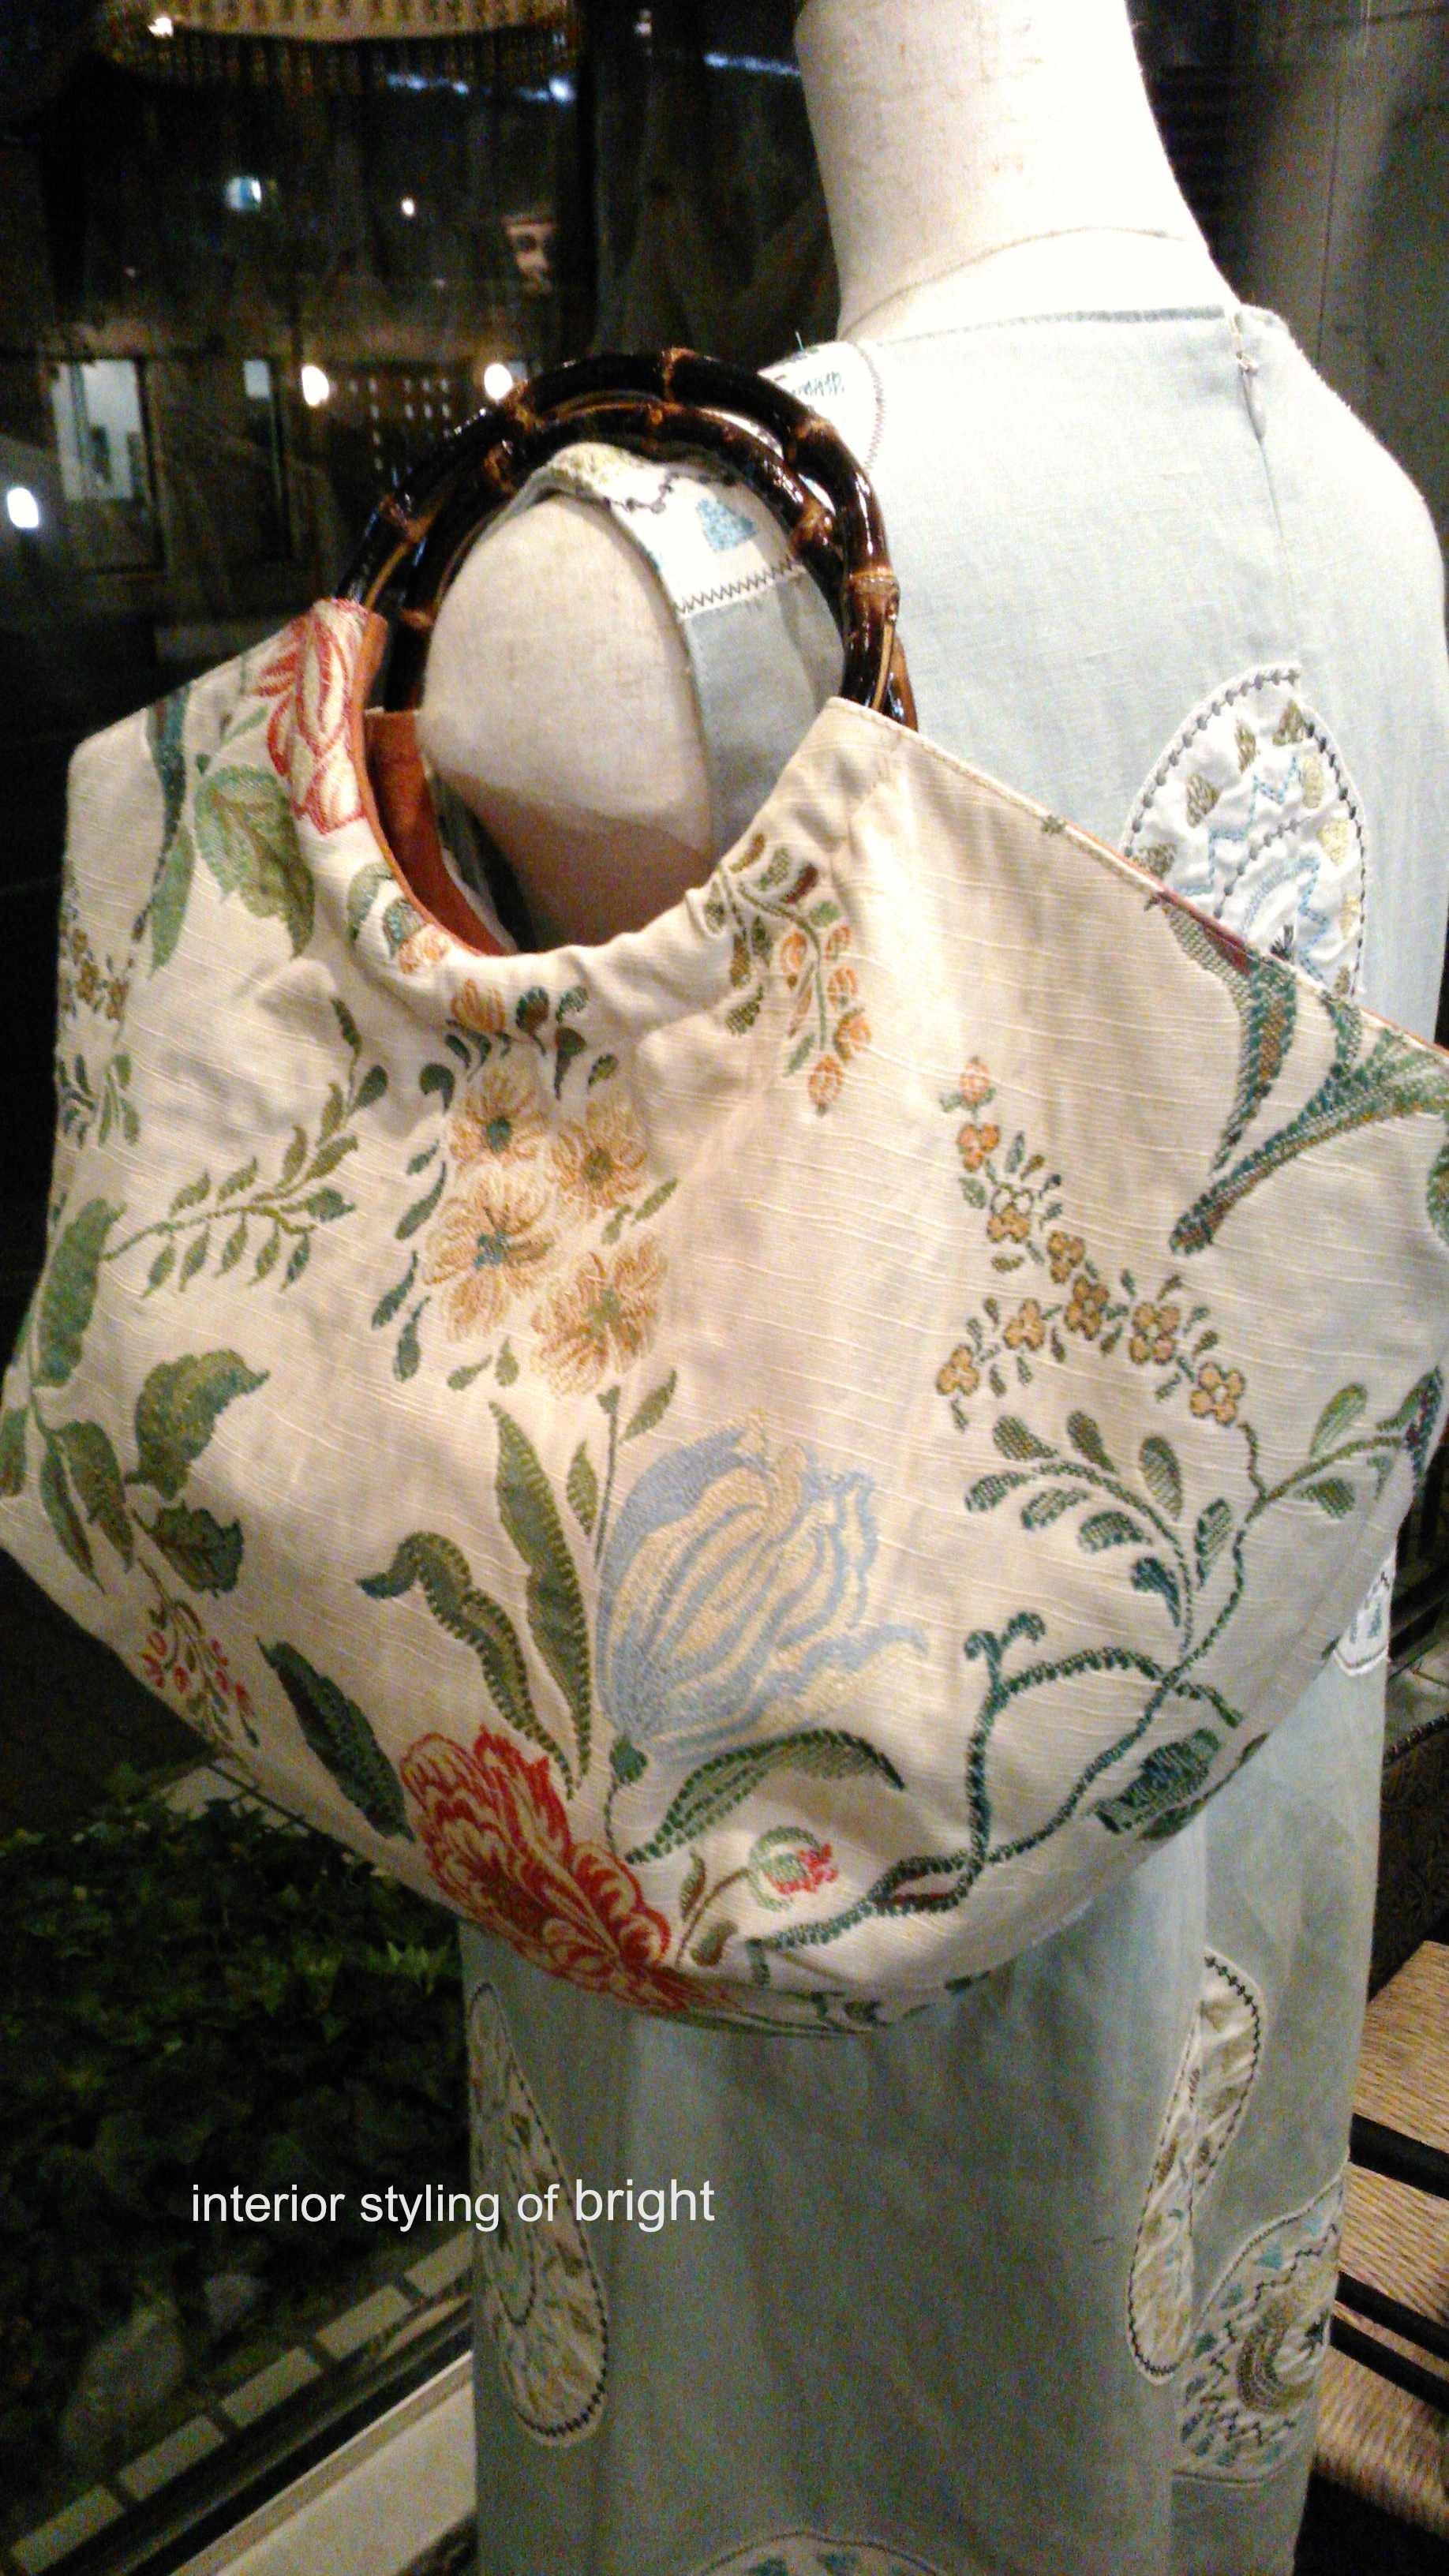 JABのバッグ ウィリアムモリス正規販売店のブライト_c0157866_20023939.jpg